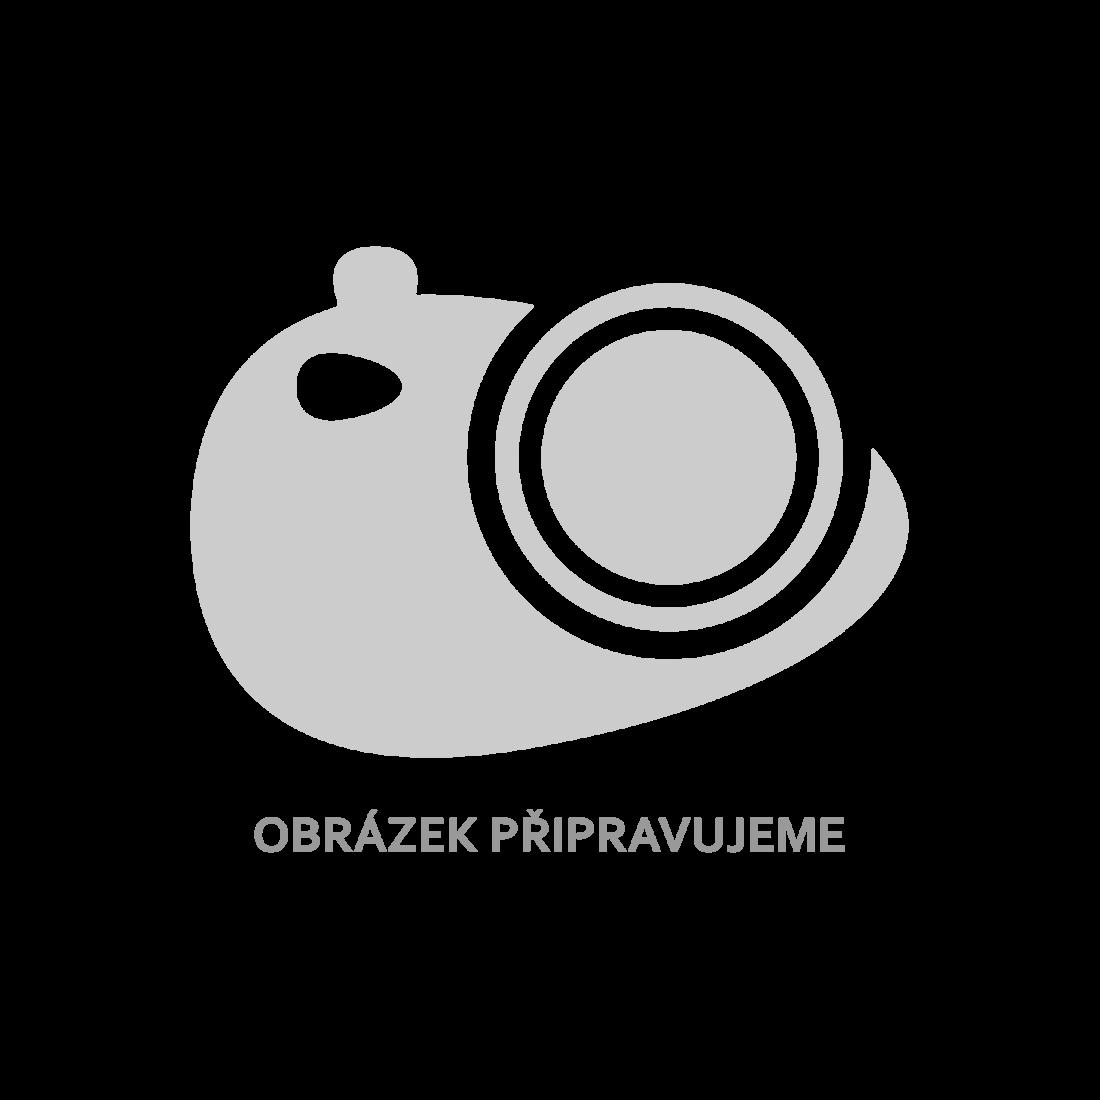 vidaXL Knihovna bílá 36 x 30 x 171 cm dřevotříska [802867]